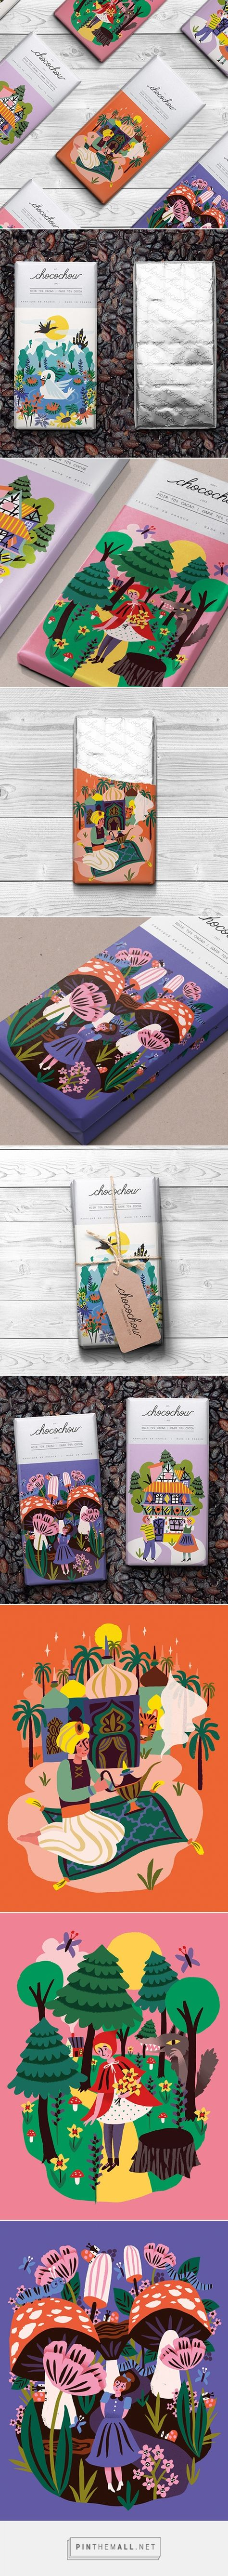 Packaging cioccolato tavolette